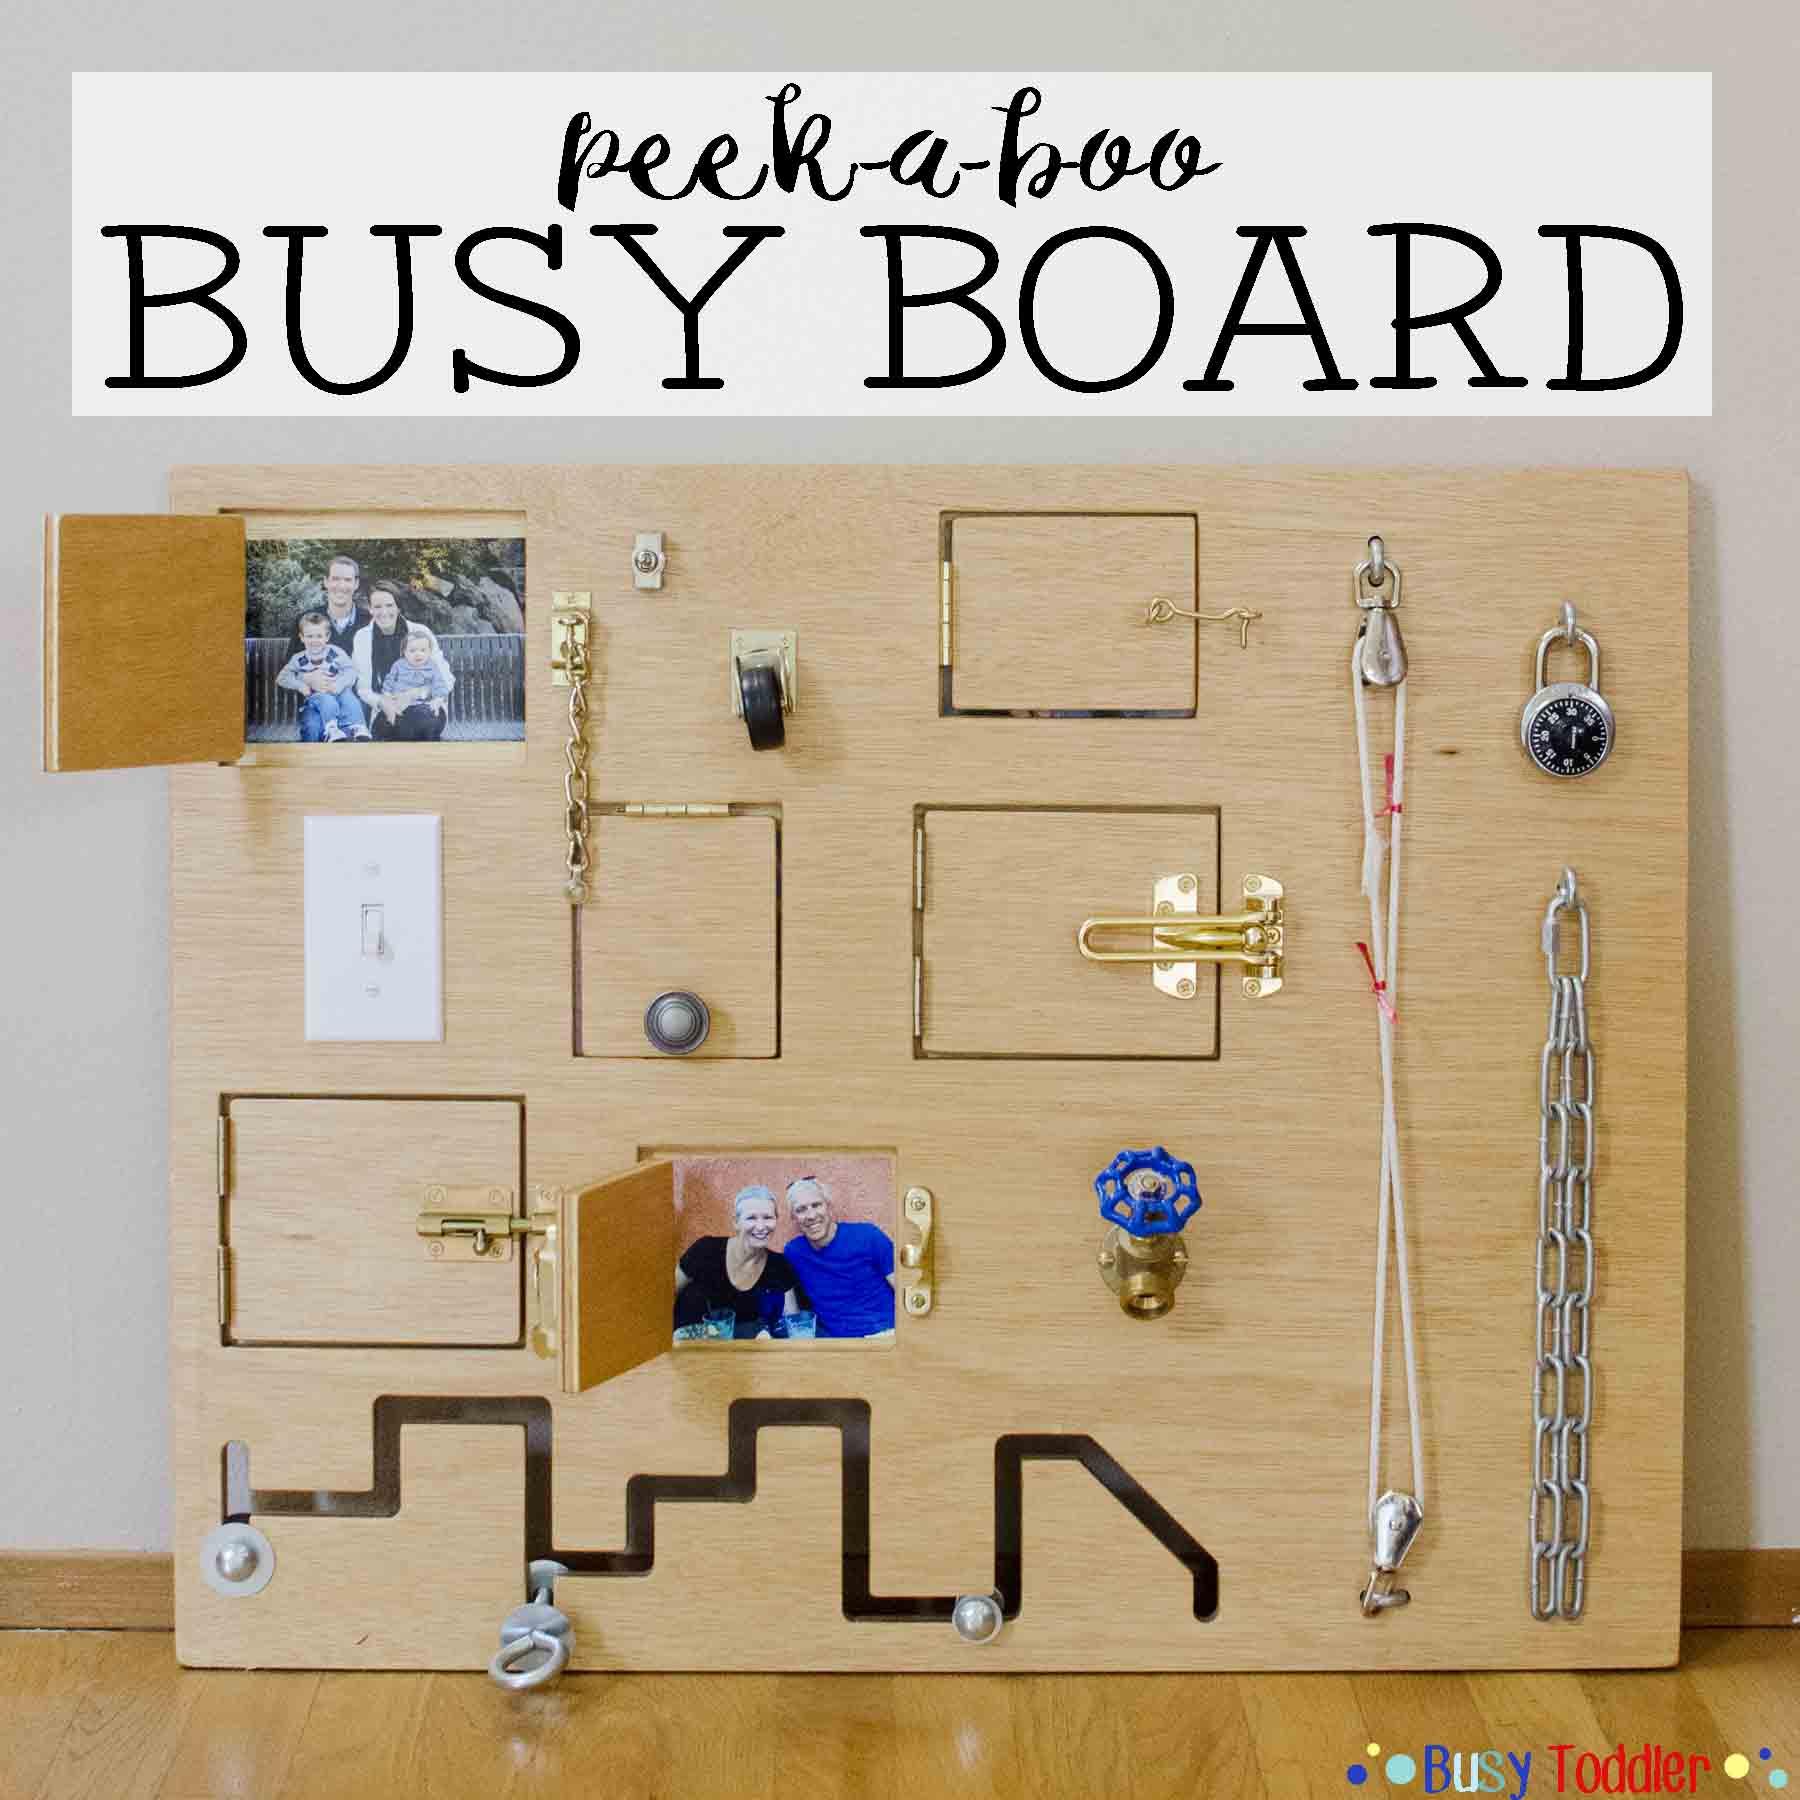 Toddler Busy Board: Peek-a-Boo Edition